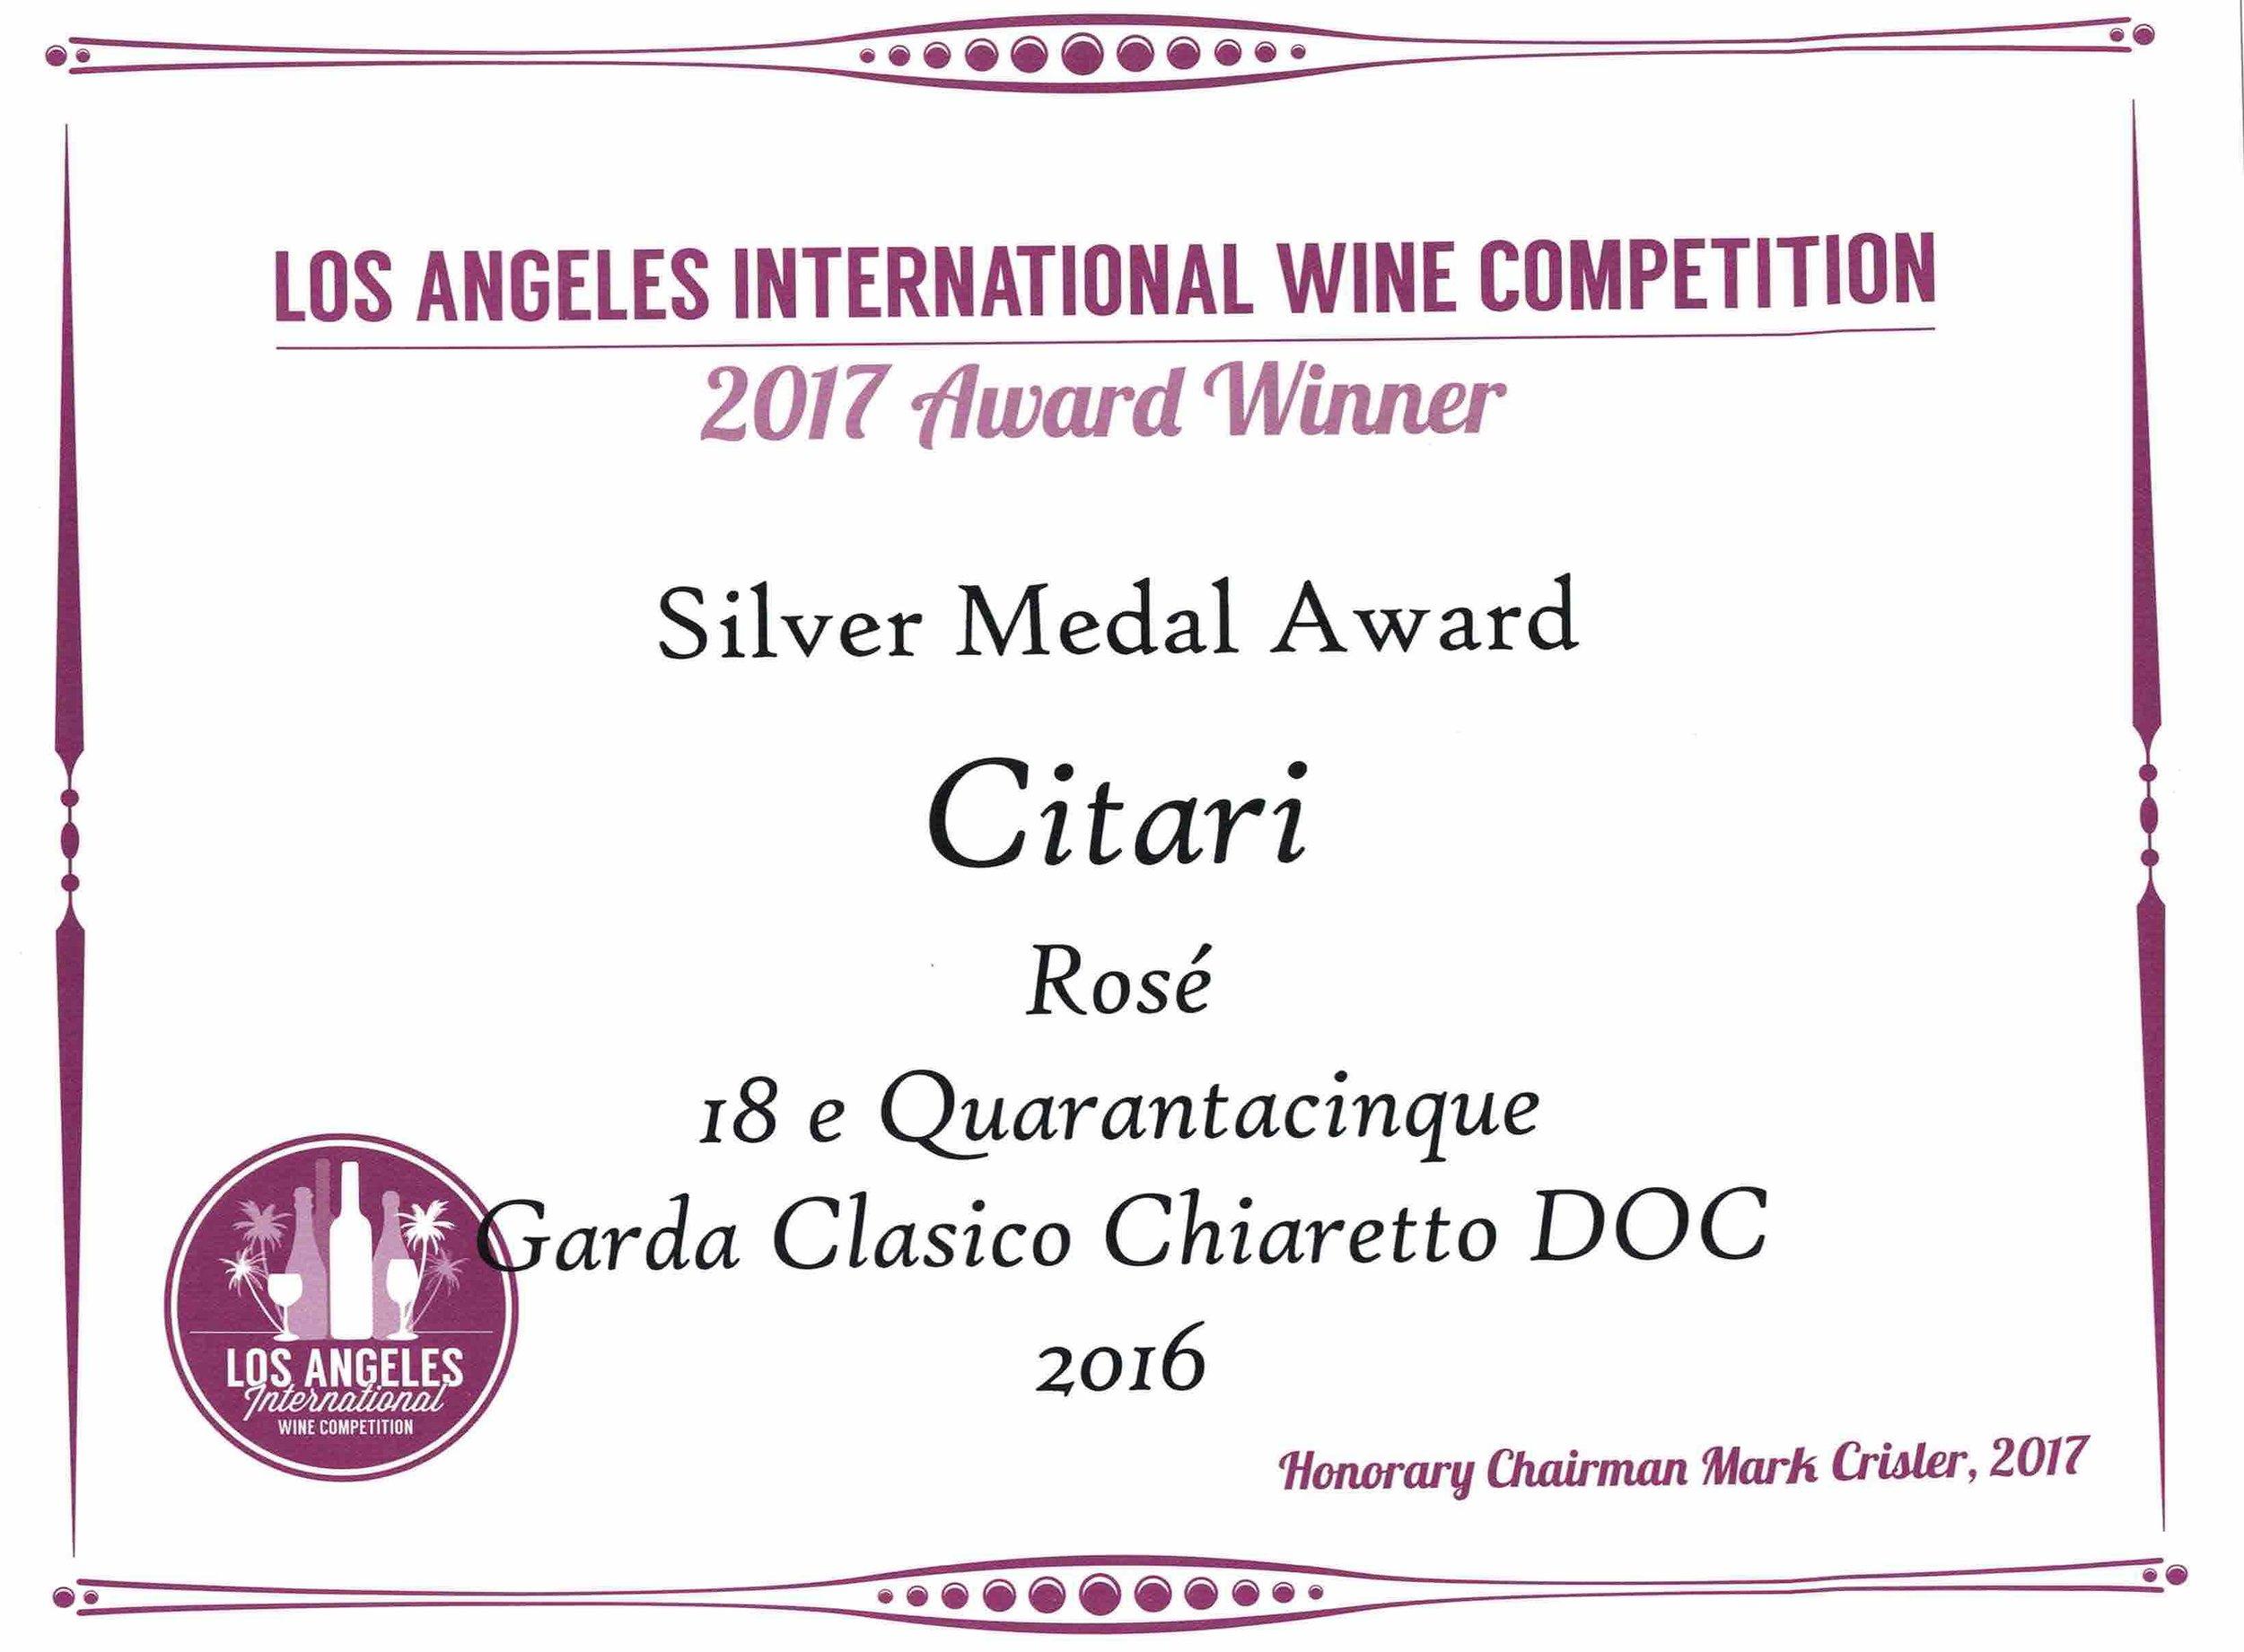 Chiaretto 2016 Silver medal jpg orizzontale.jpg